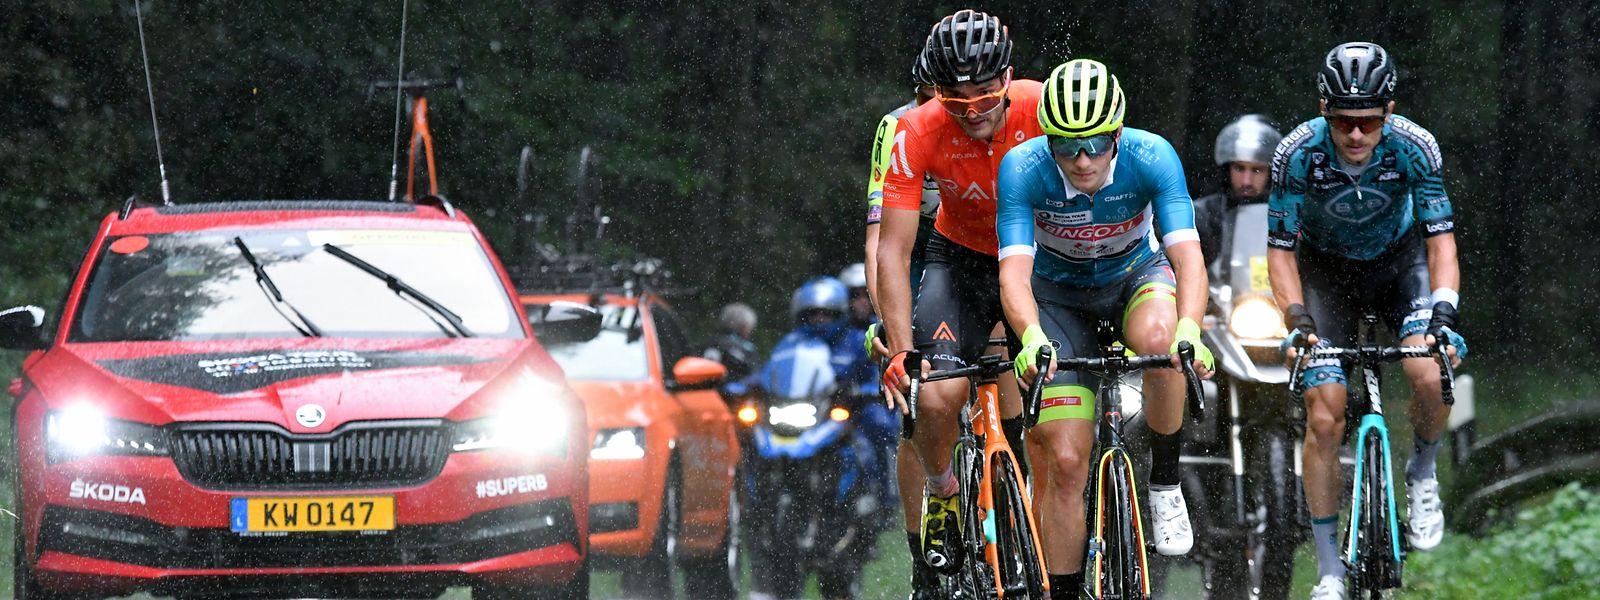 Course. Cyclisme: Skoda Tour du Luxembourg. Boulaide. Foto: Stéphane Guillaume